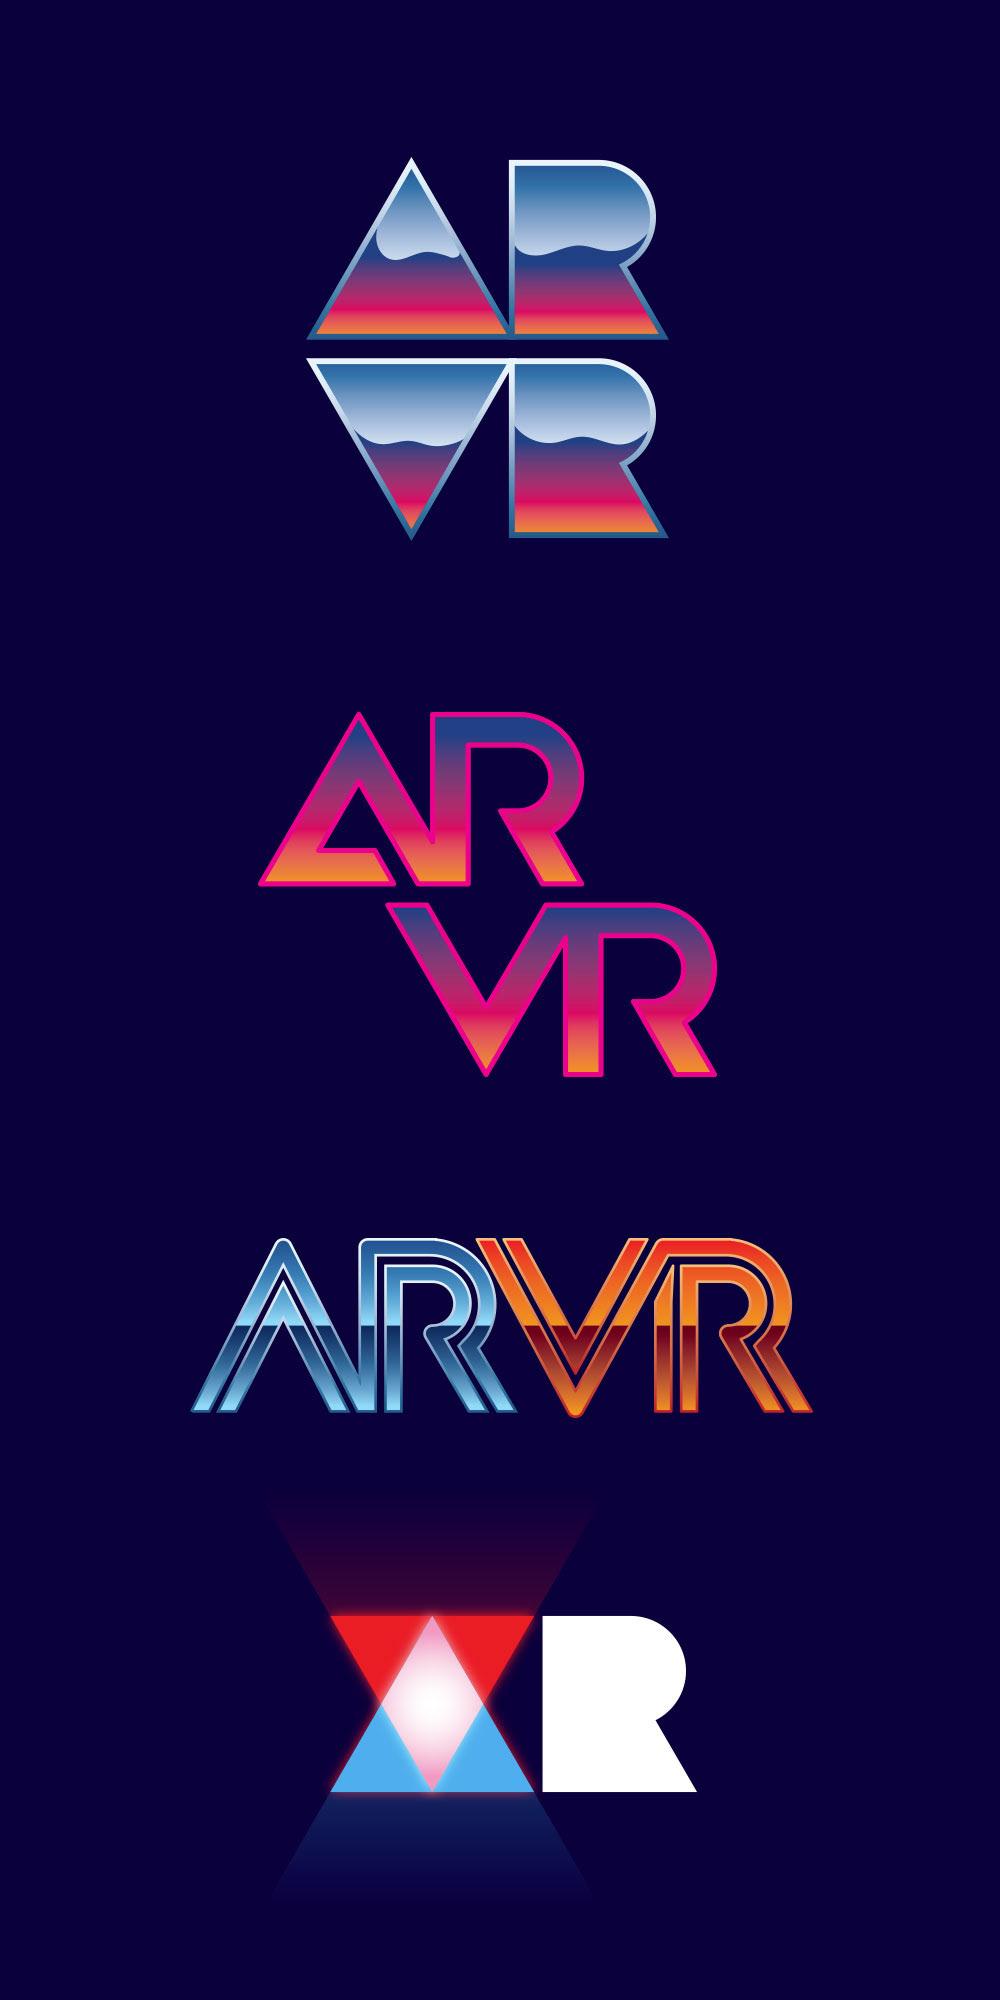 design graphic design  branding  logo Illustrator photoshop facebook neon AR vr